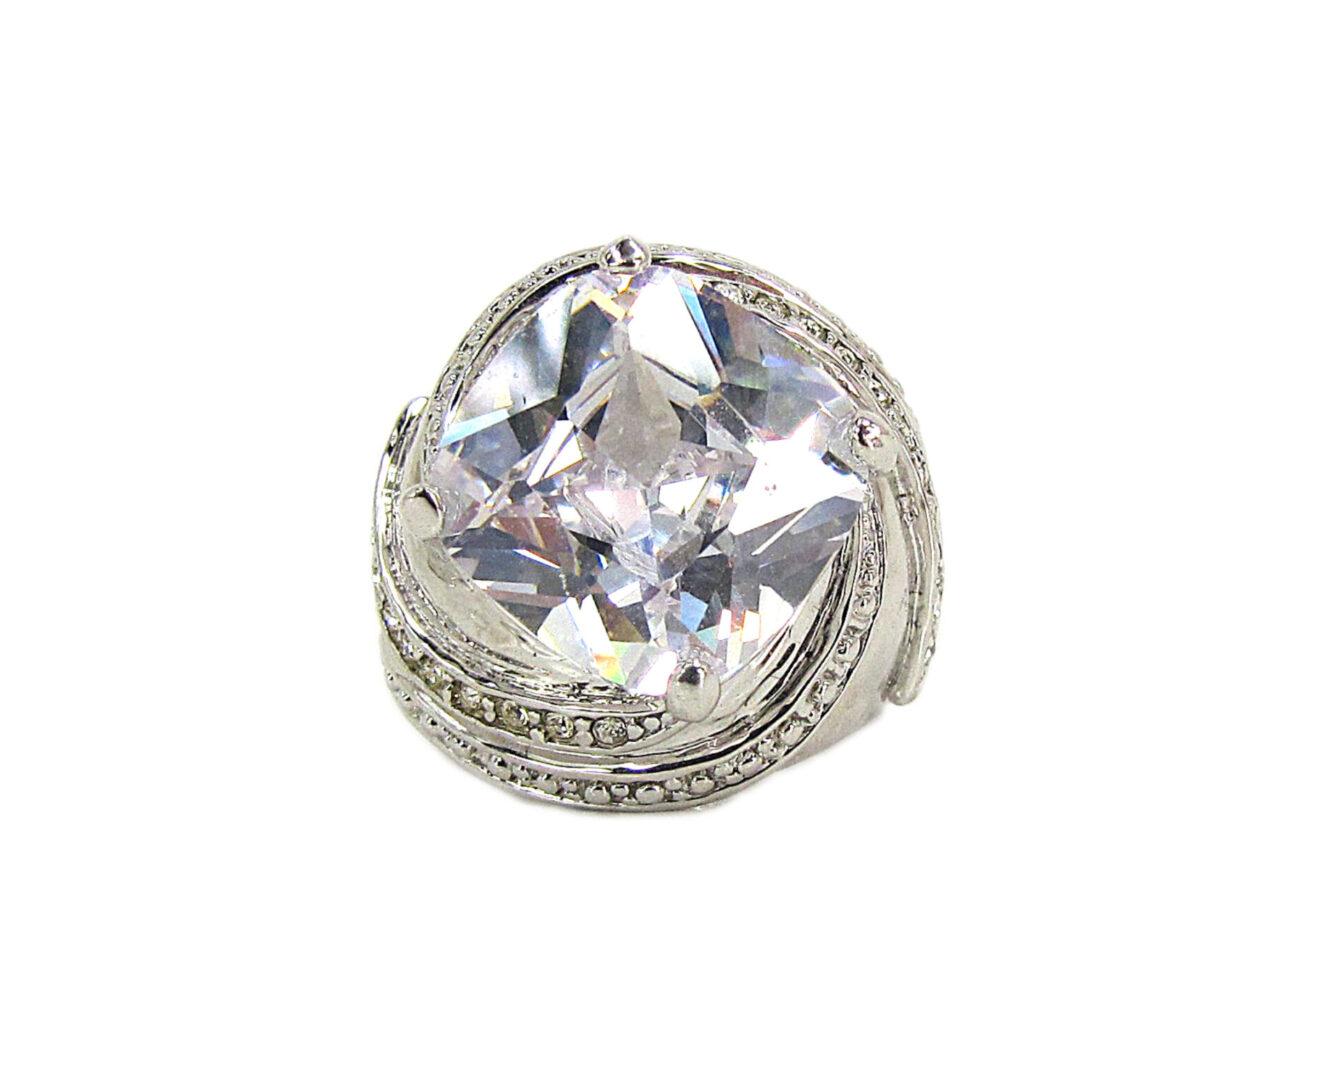 diamond ring with twisting design